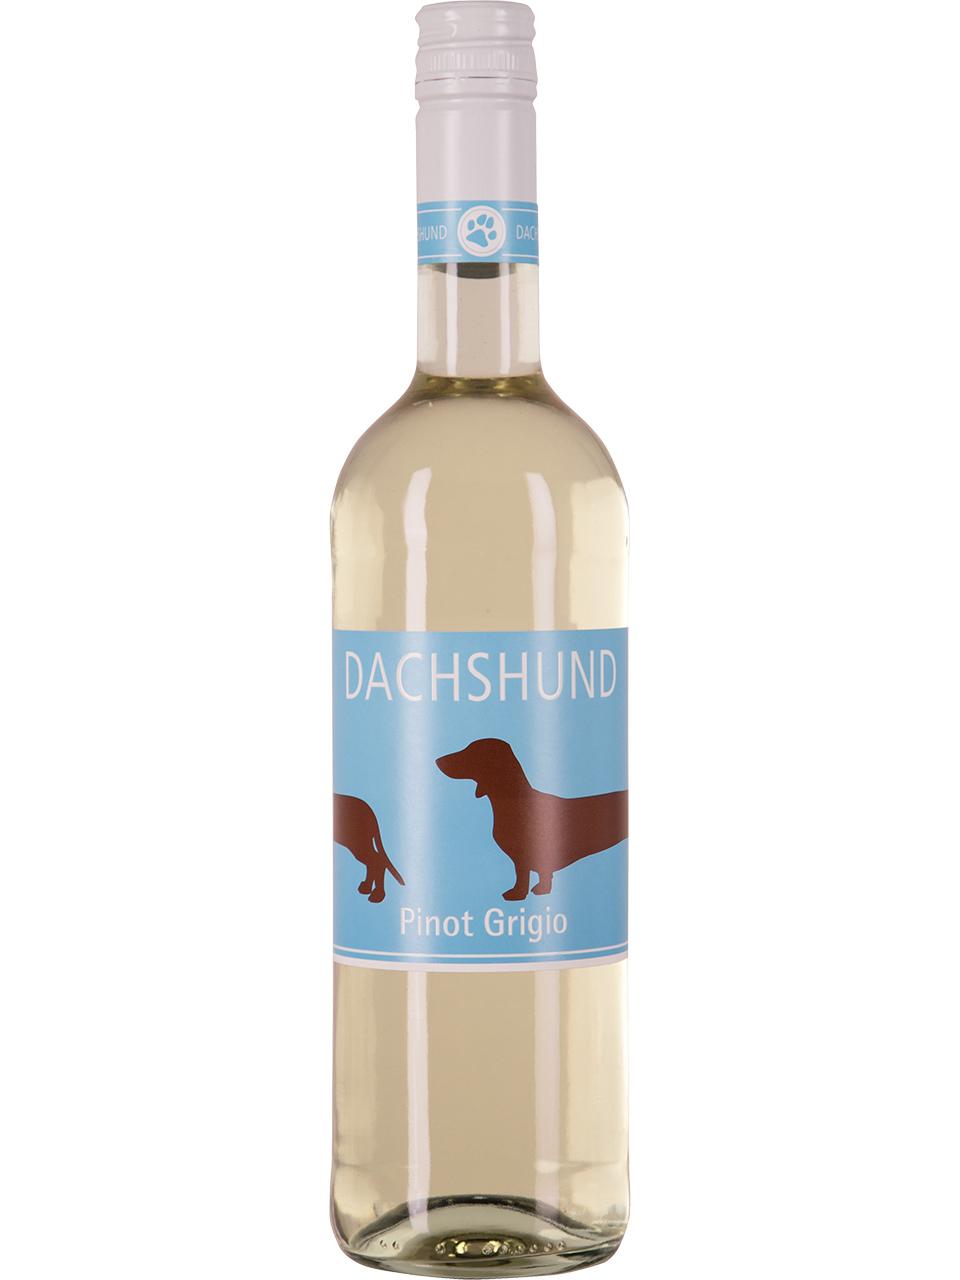 Moselland Dachshund Pinot Grigio